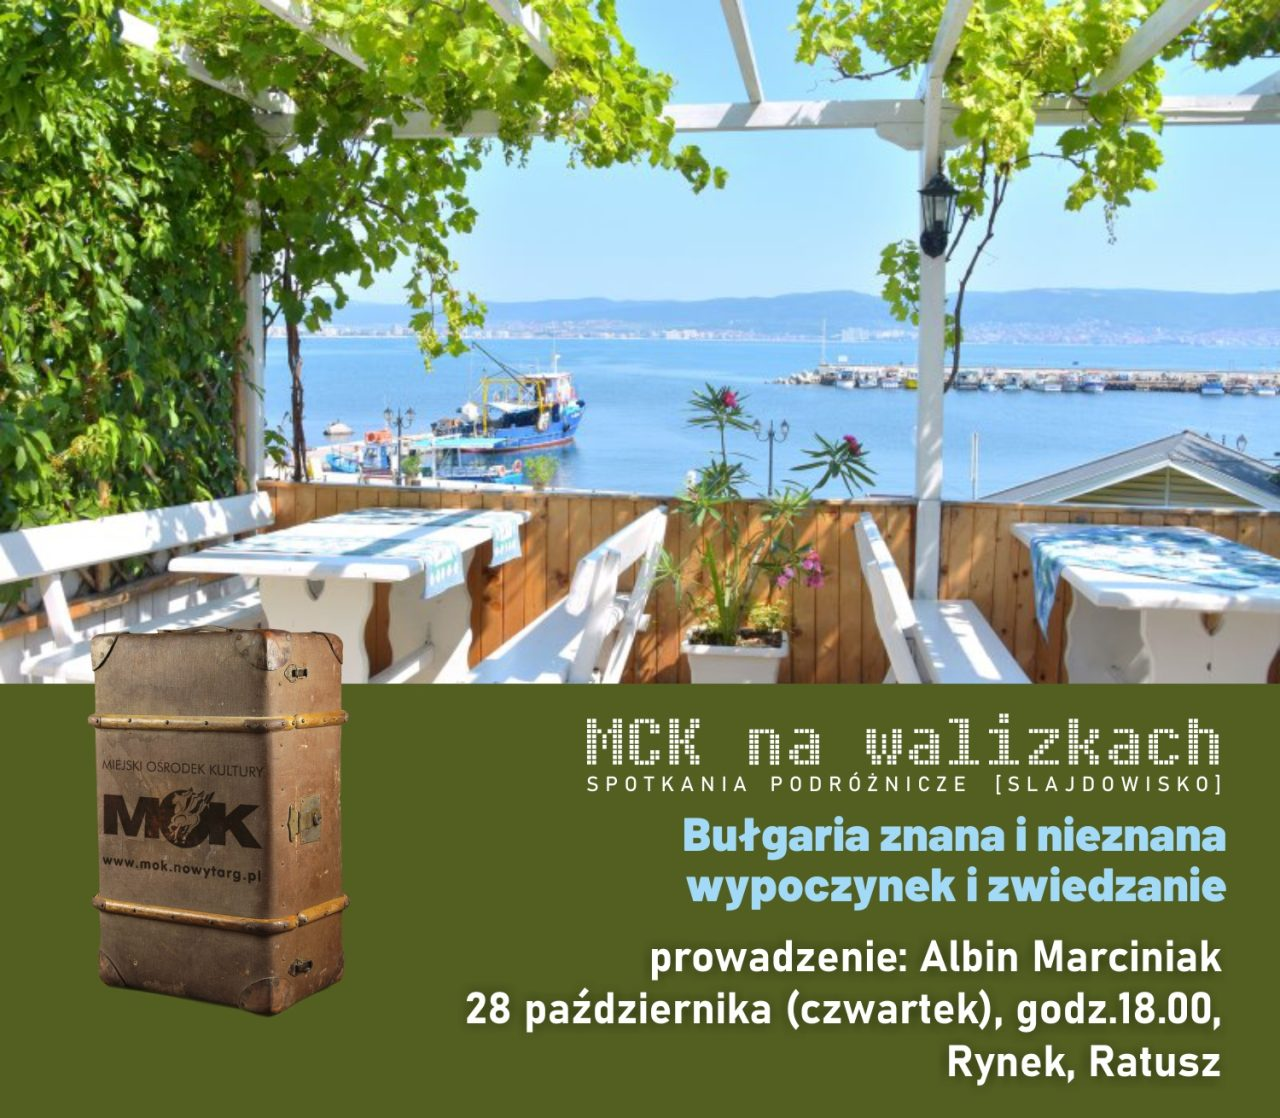 Bułgaria znana i nieznana